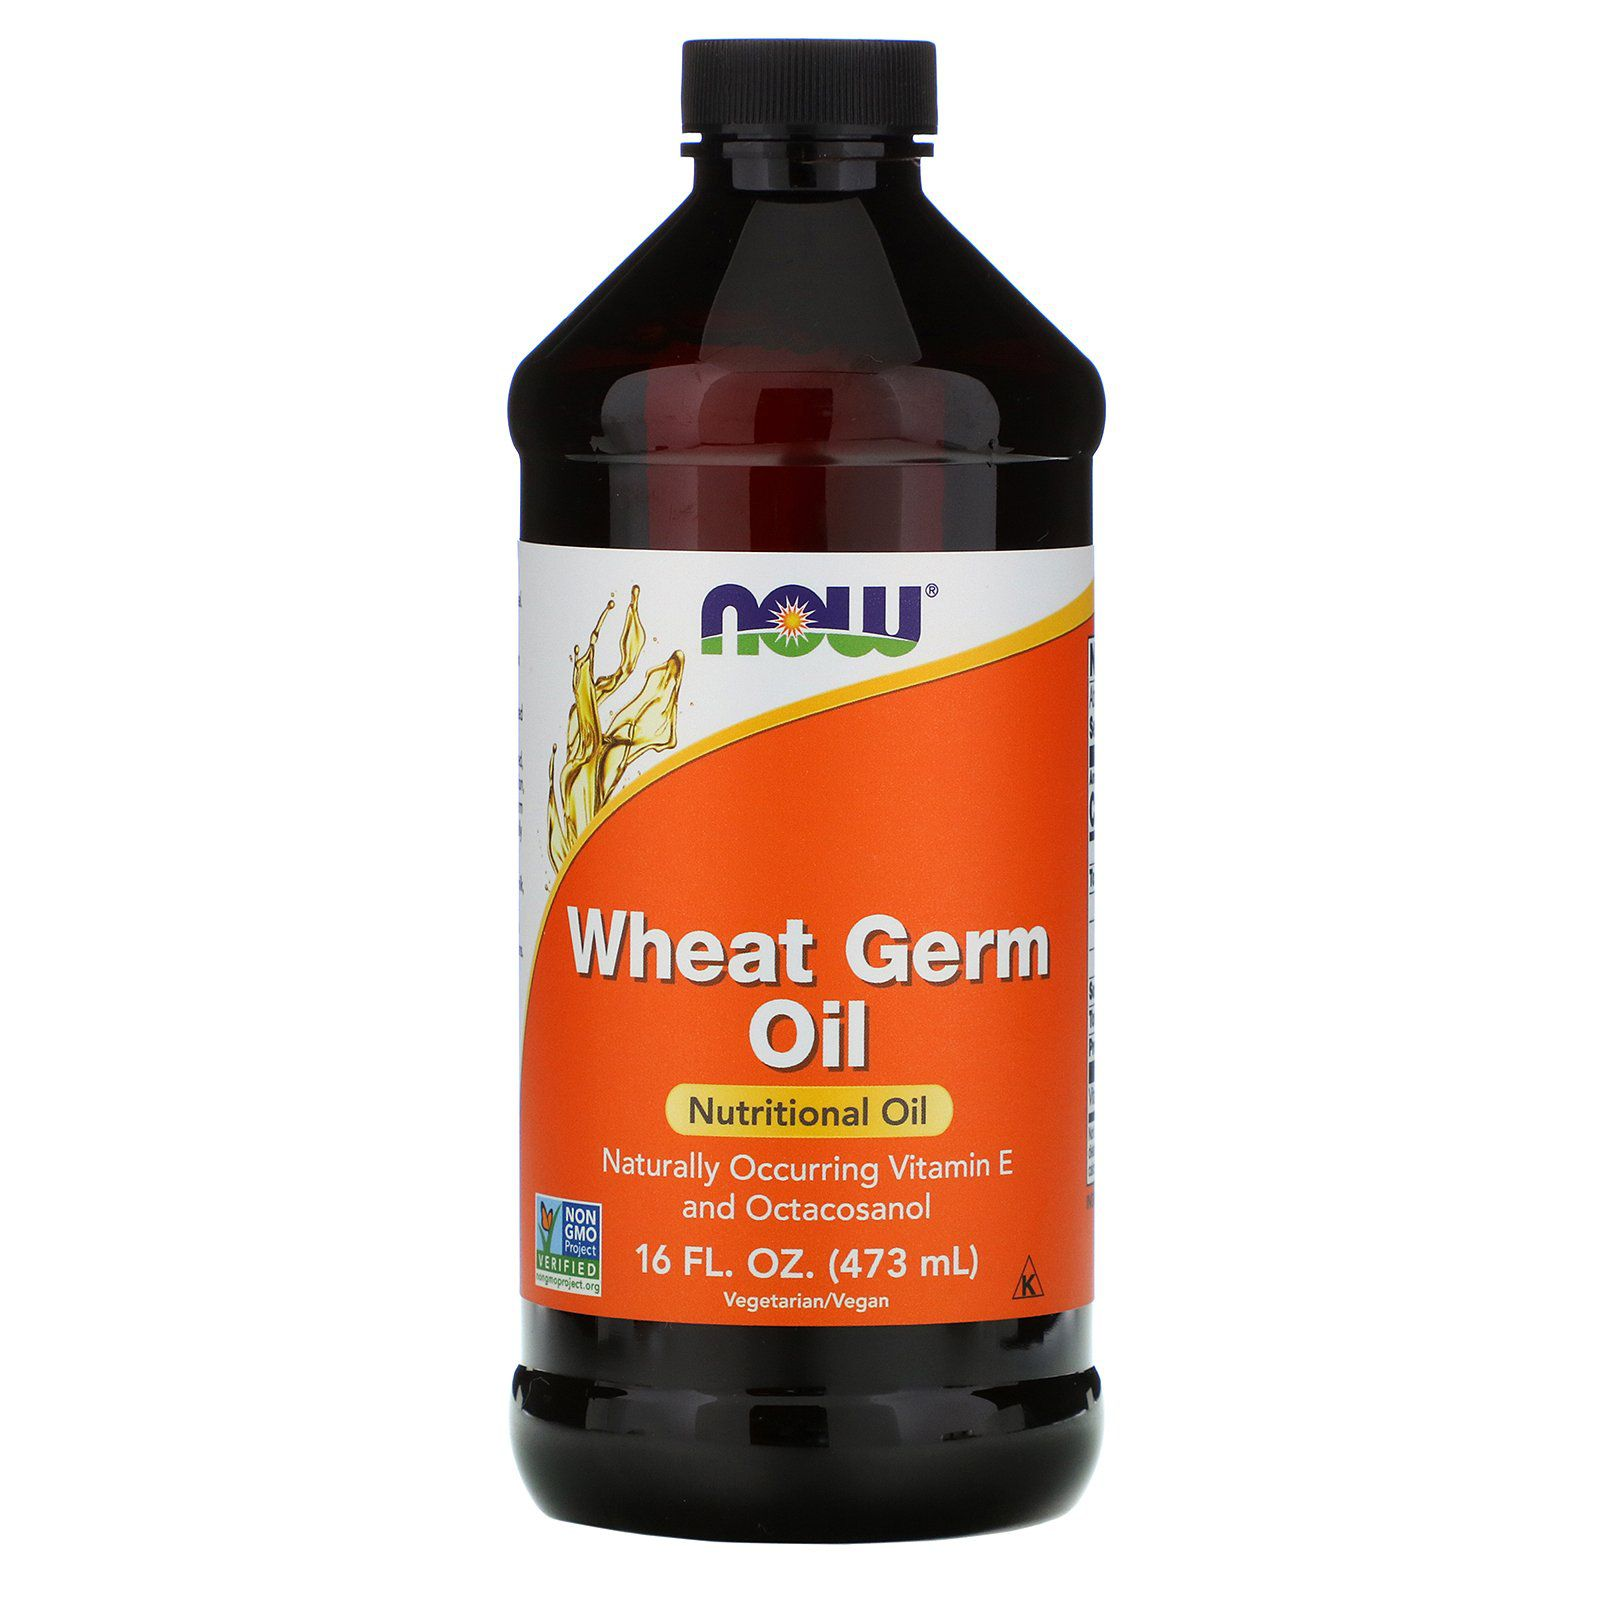 NOW Wheat Germ Oil